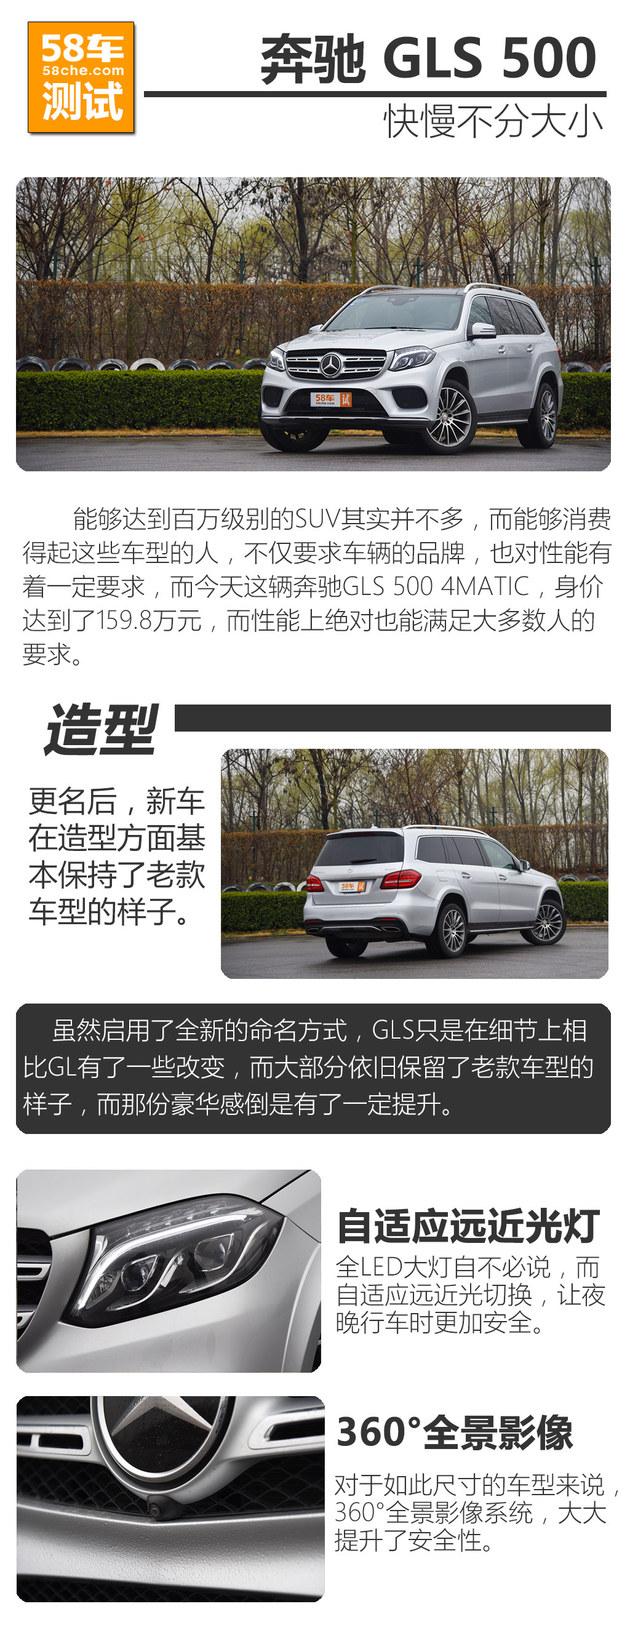 奔驰GLS 500 4MATIC测试 7座SUV也很快